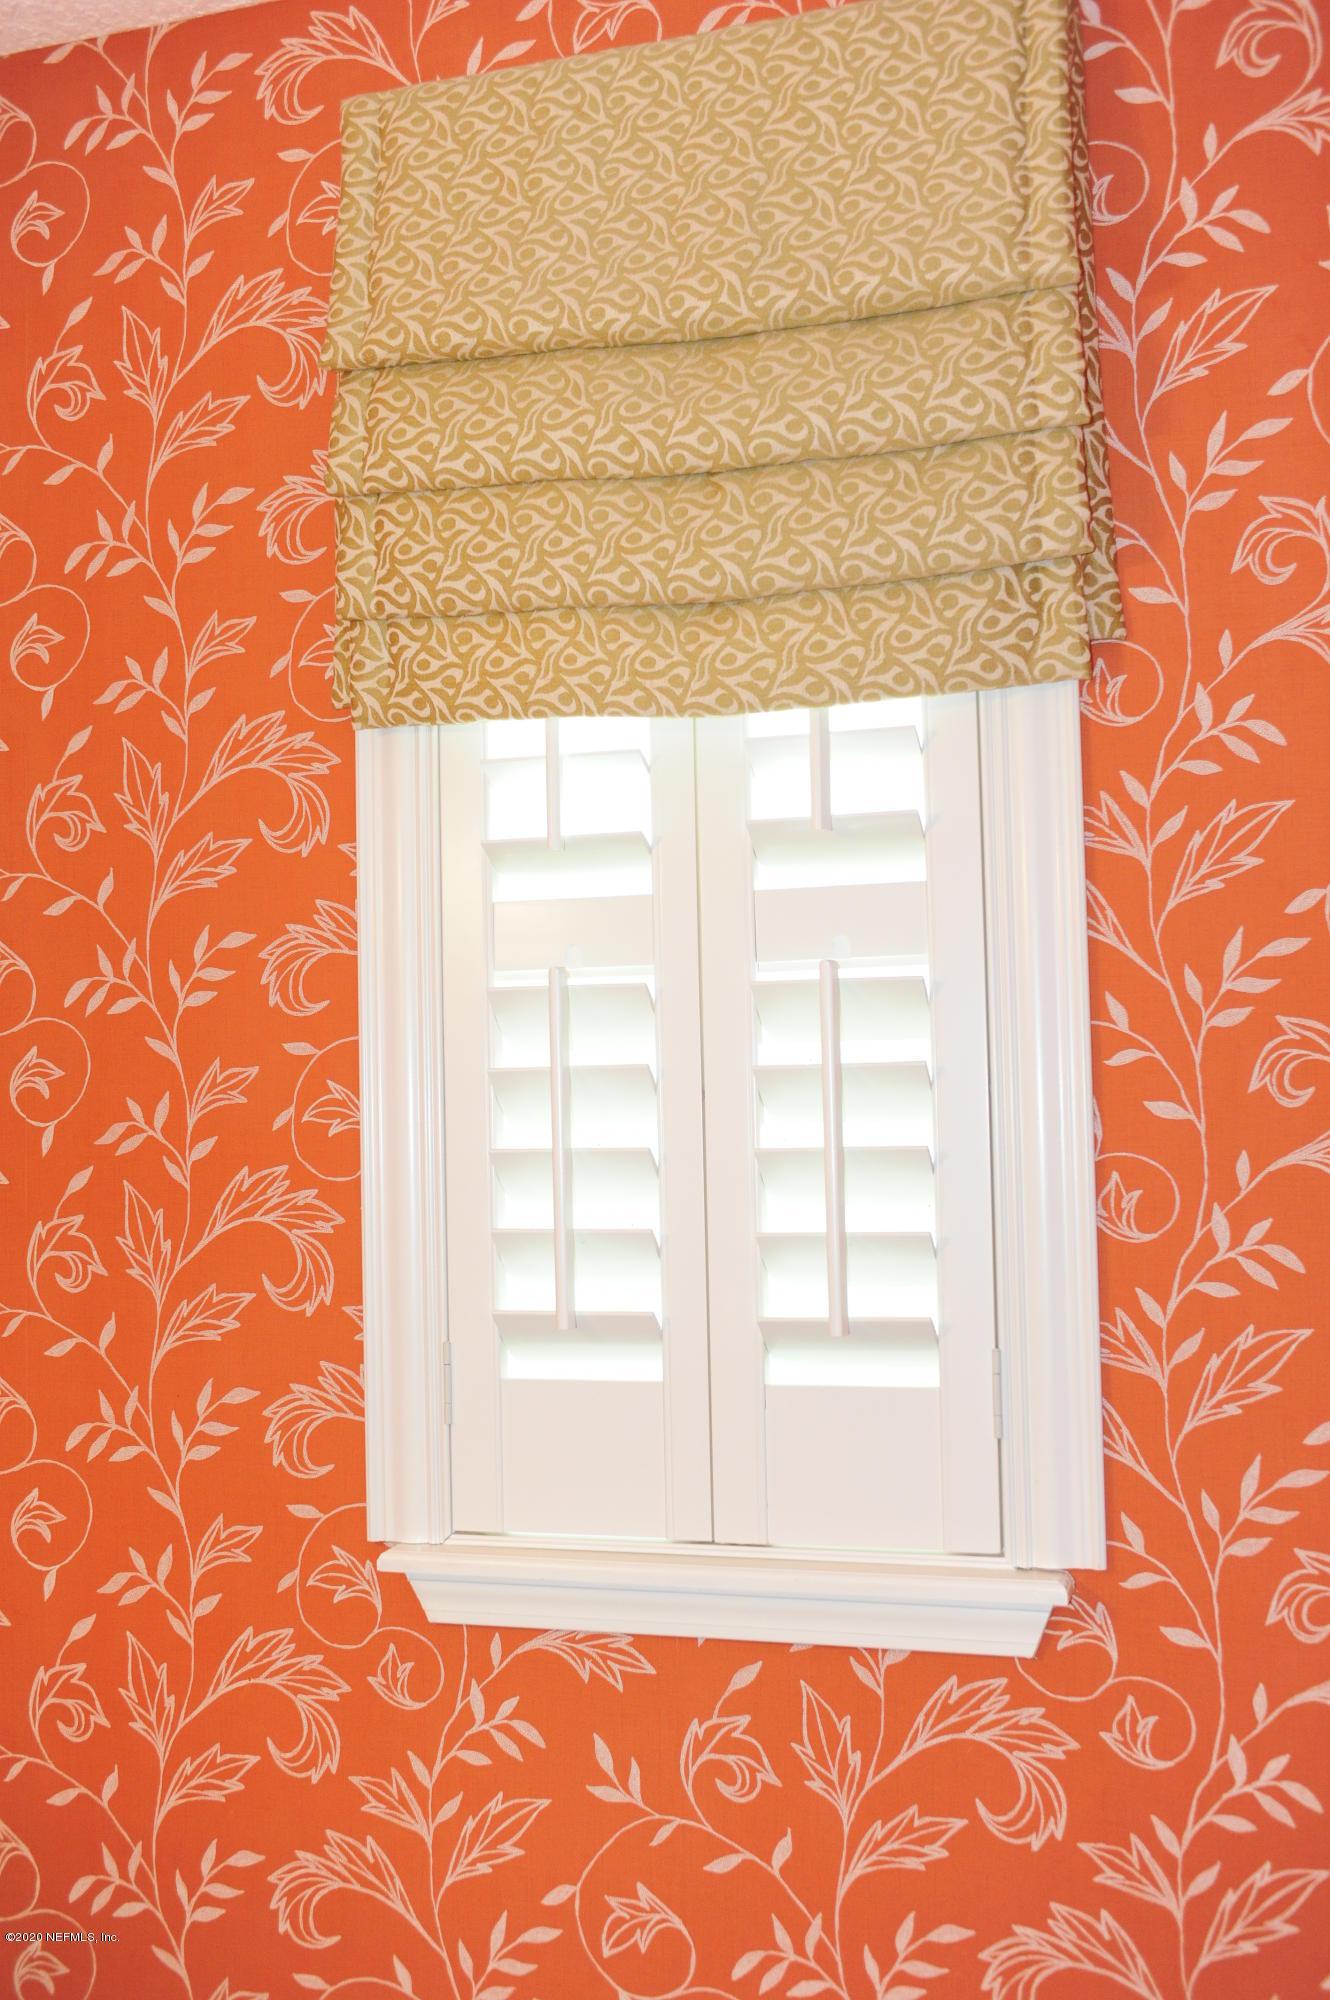 418 KIRKLAND, ORANGE PARK, FLORIDA 32065, 4 Bedrooms Bedrooms, ,2 BathroomsBathrooms,Residential,For sale,KIRKLAND,1060692